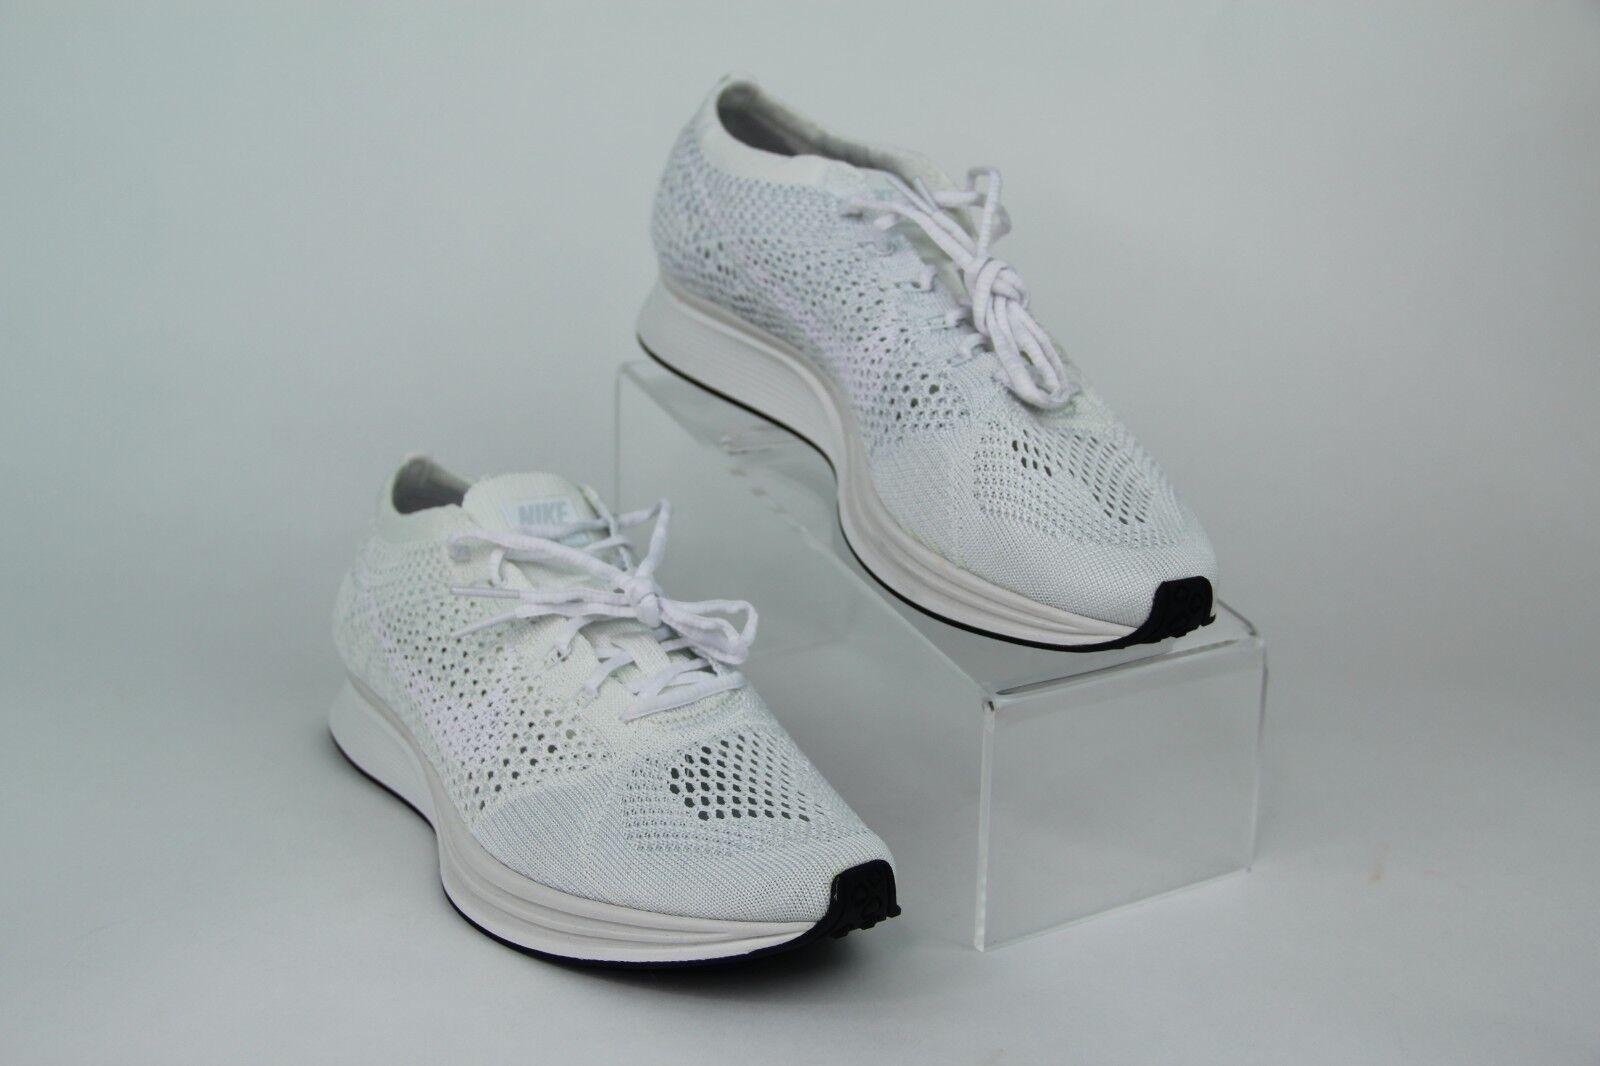 Nike Flyknit Racer Goddess Triple White Sail Sail Sail Pure Platinum 526628-100 SZ b85fbc